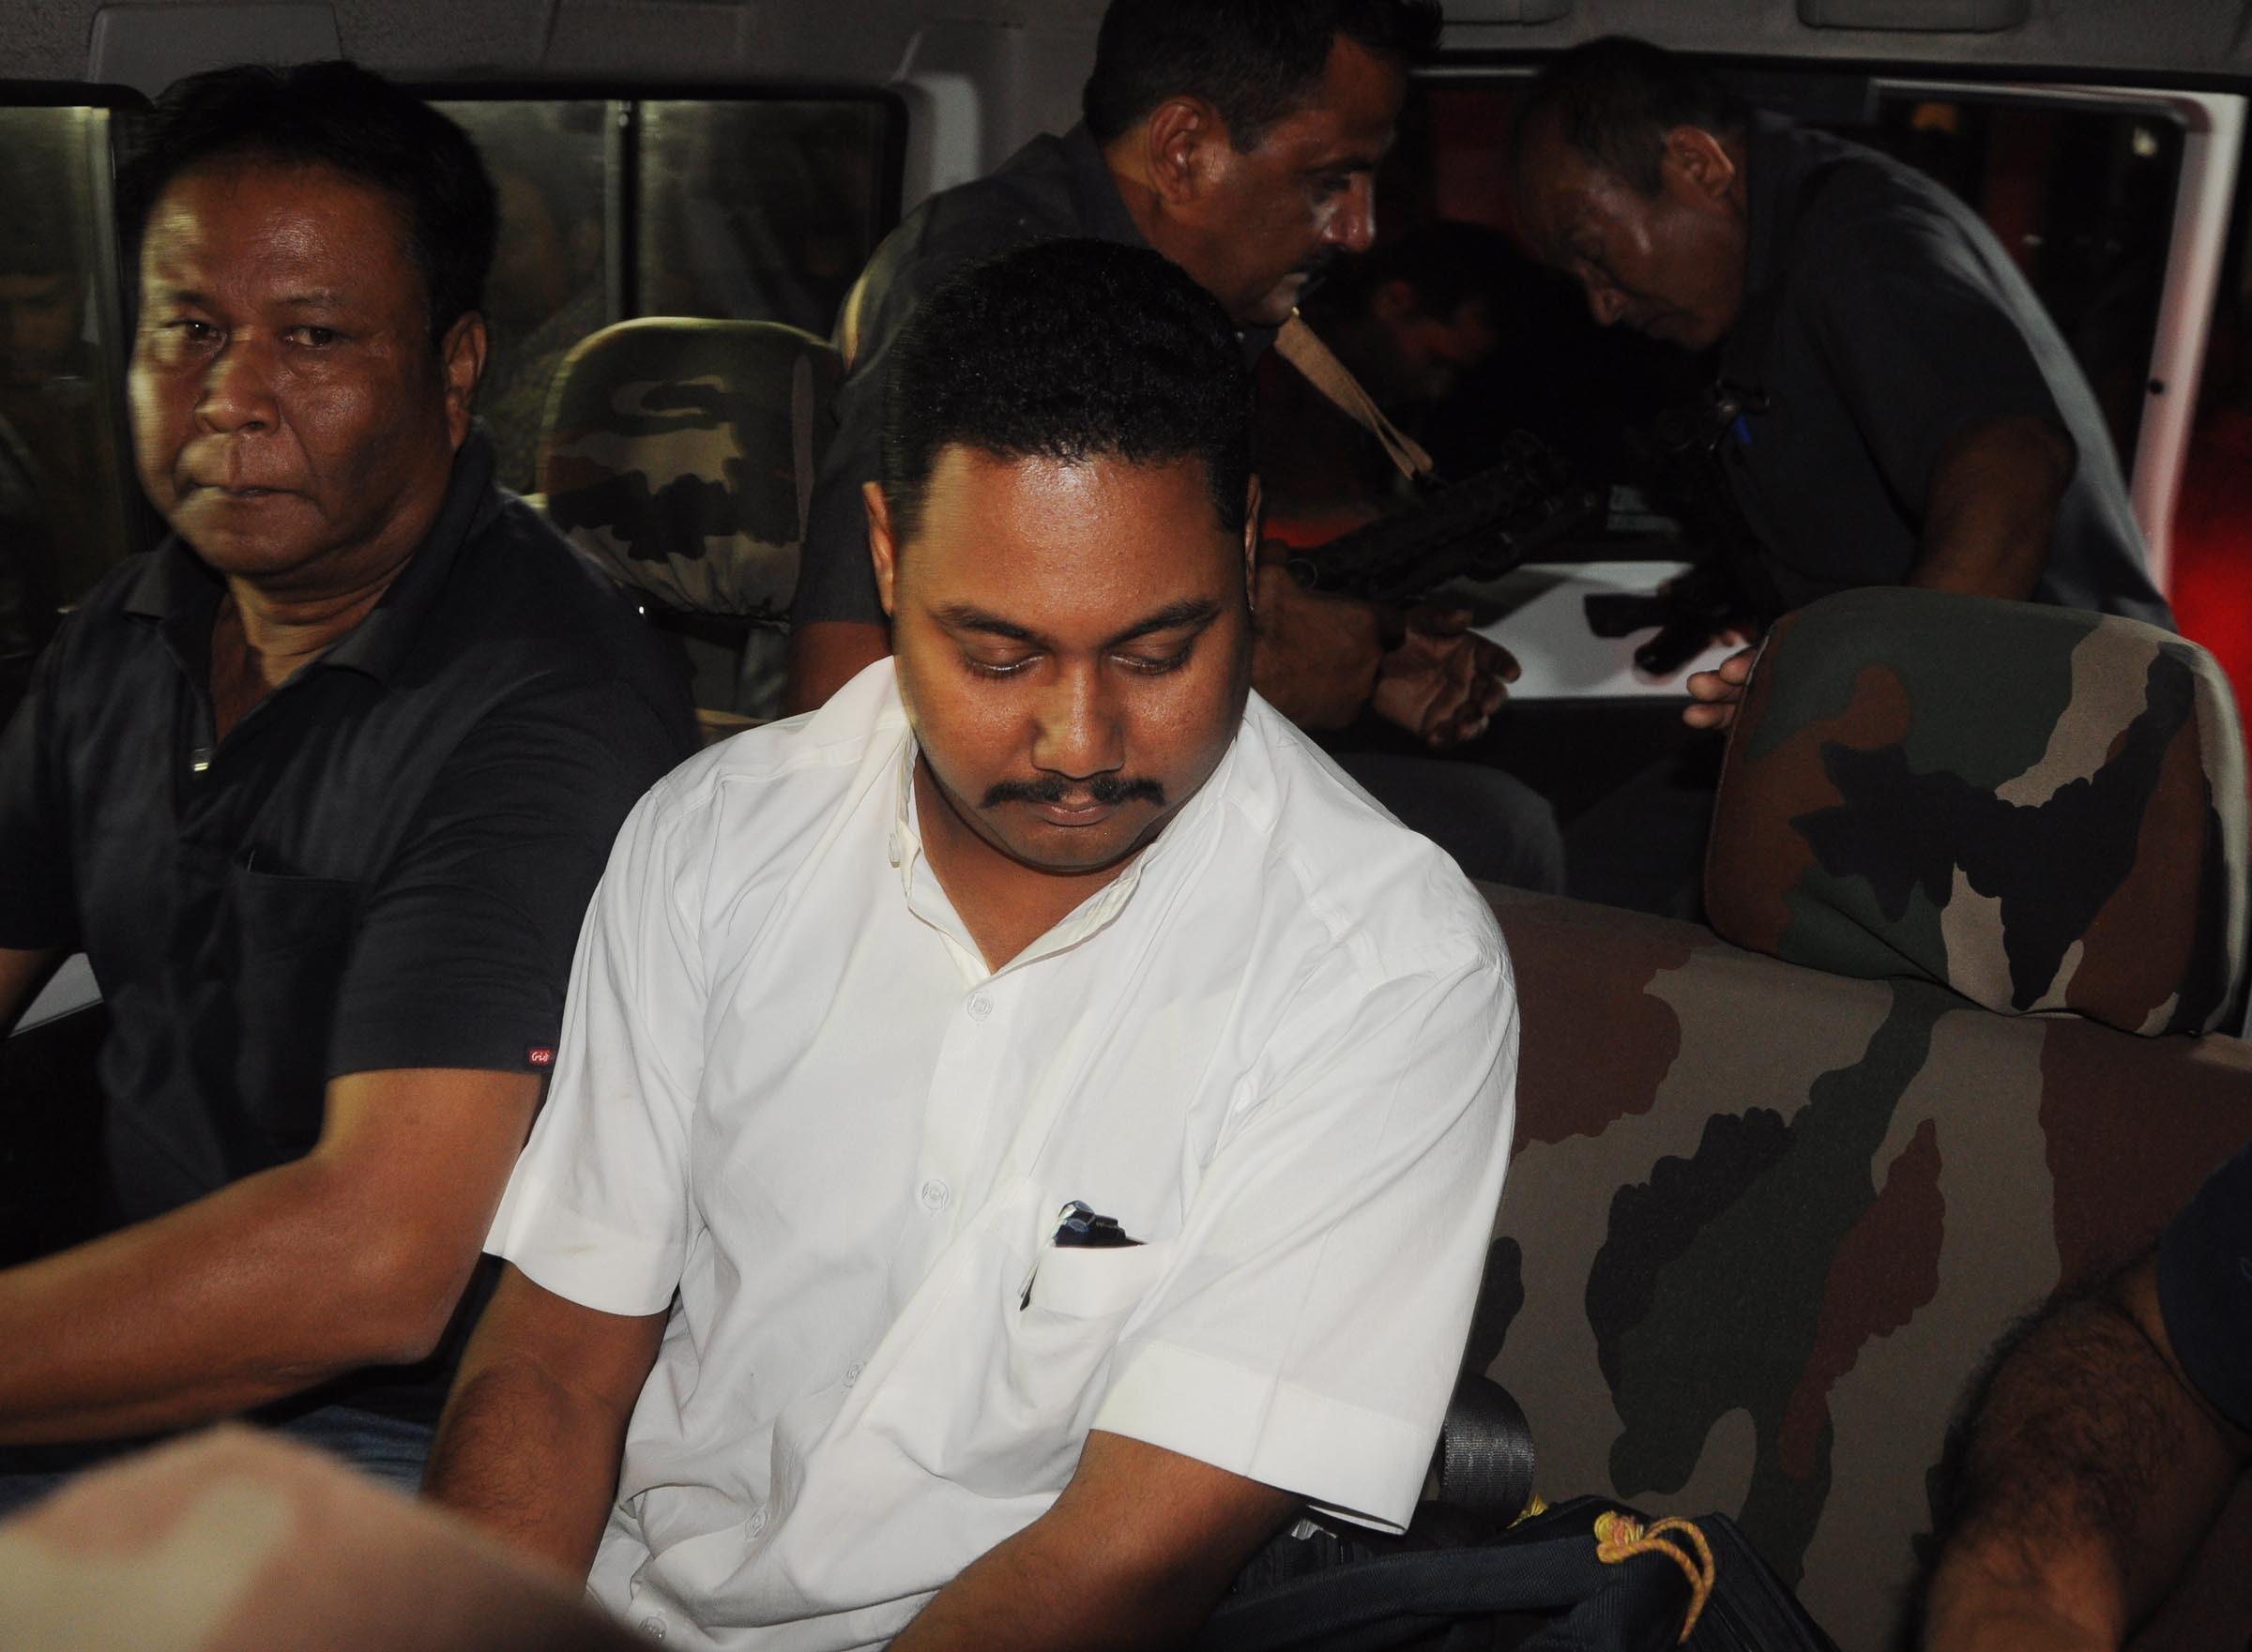 Rajashree sen Deka at court in Guwahati.